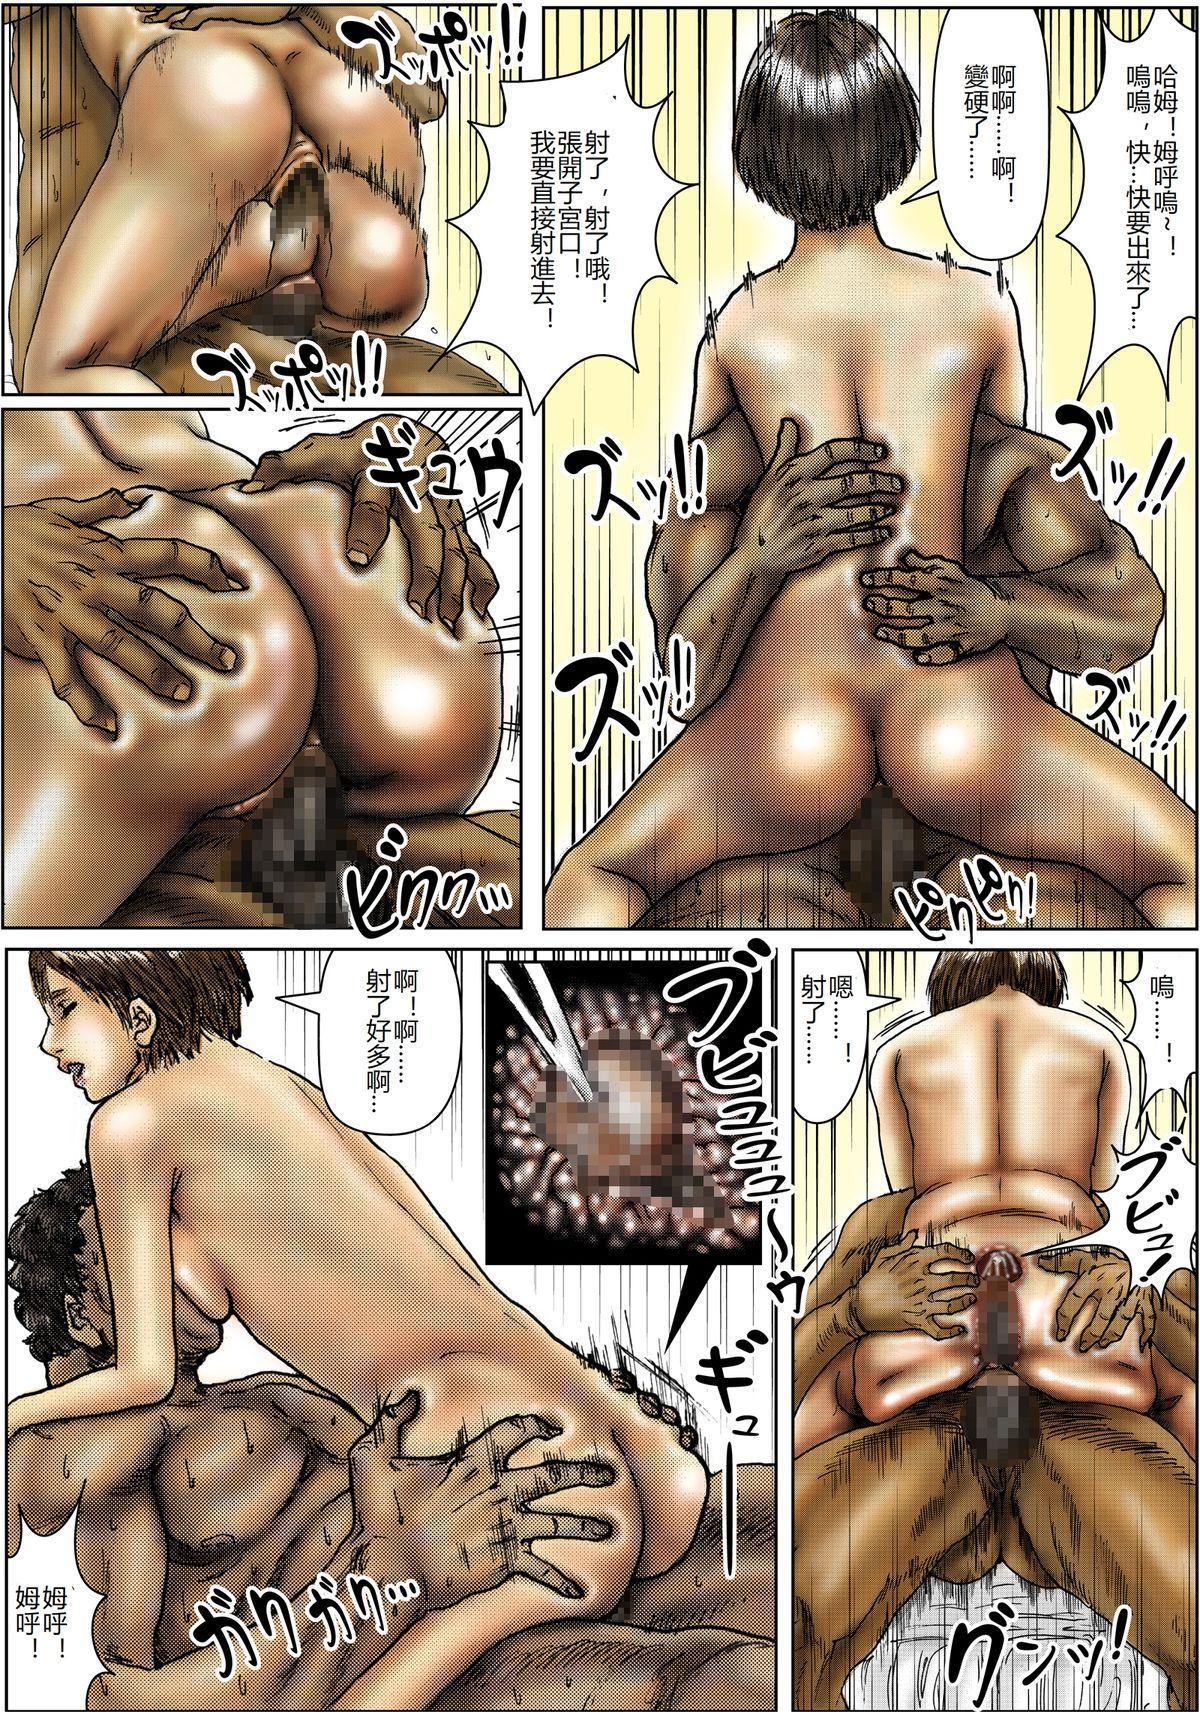 BODY HAZARD 5 Shushou Hen 16